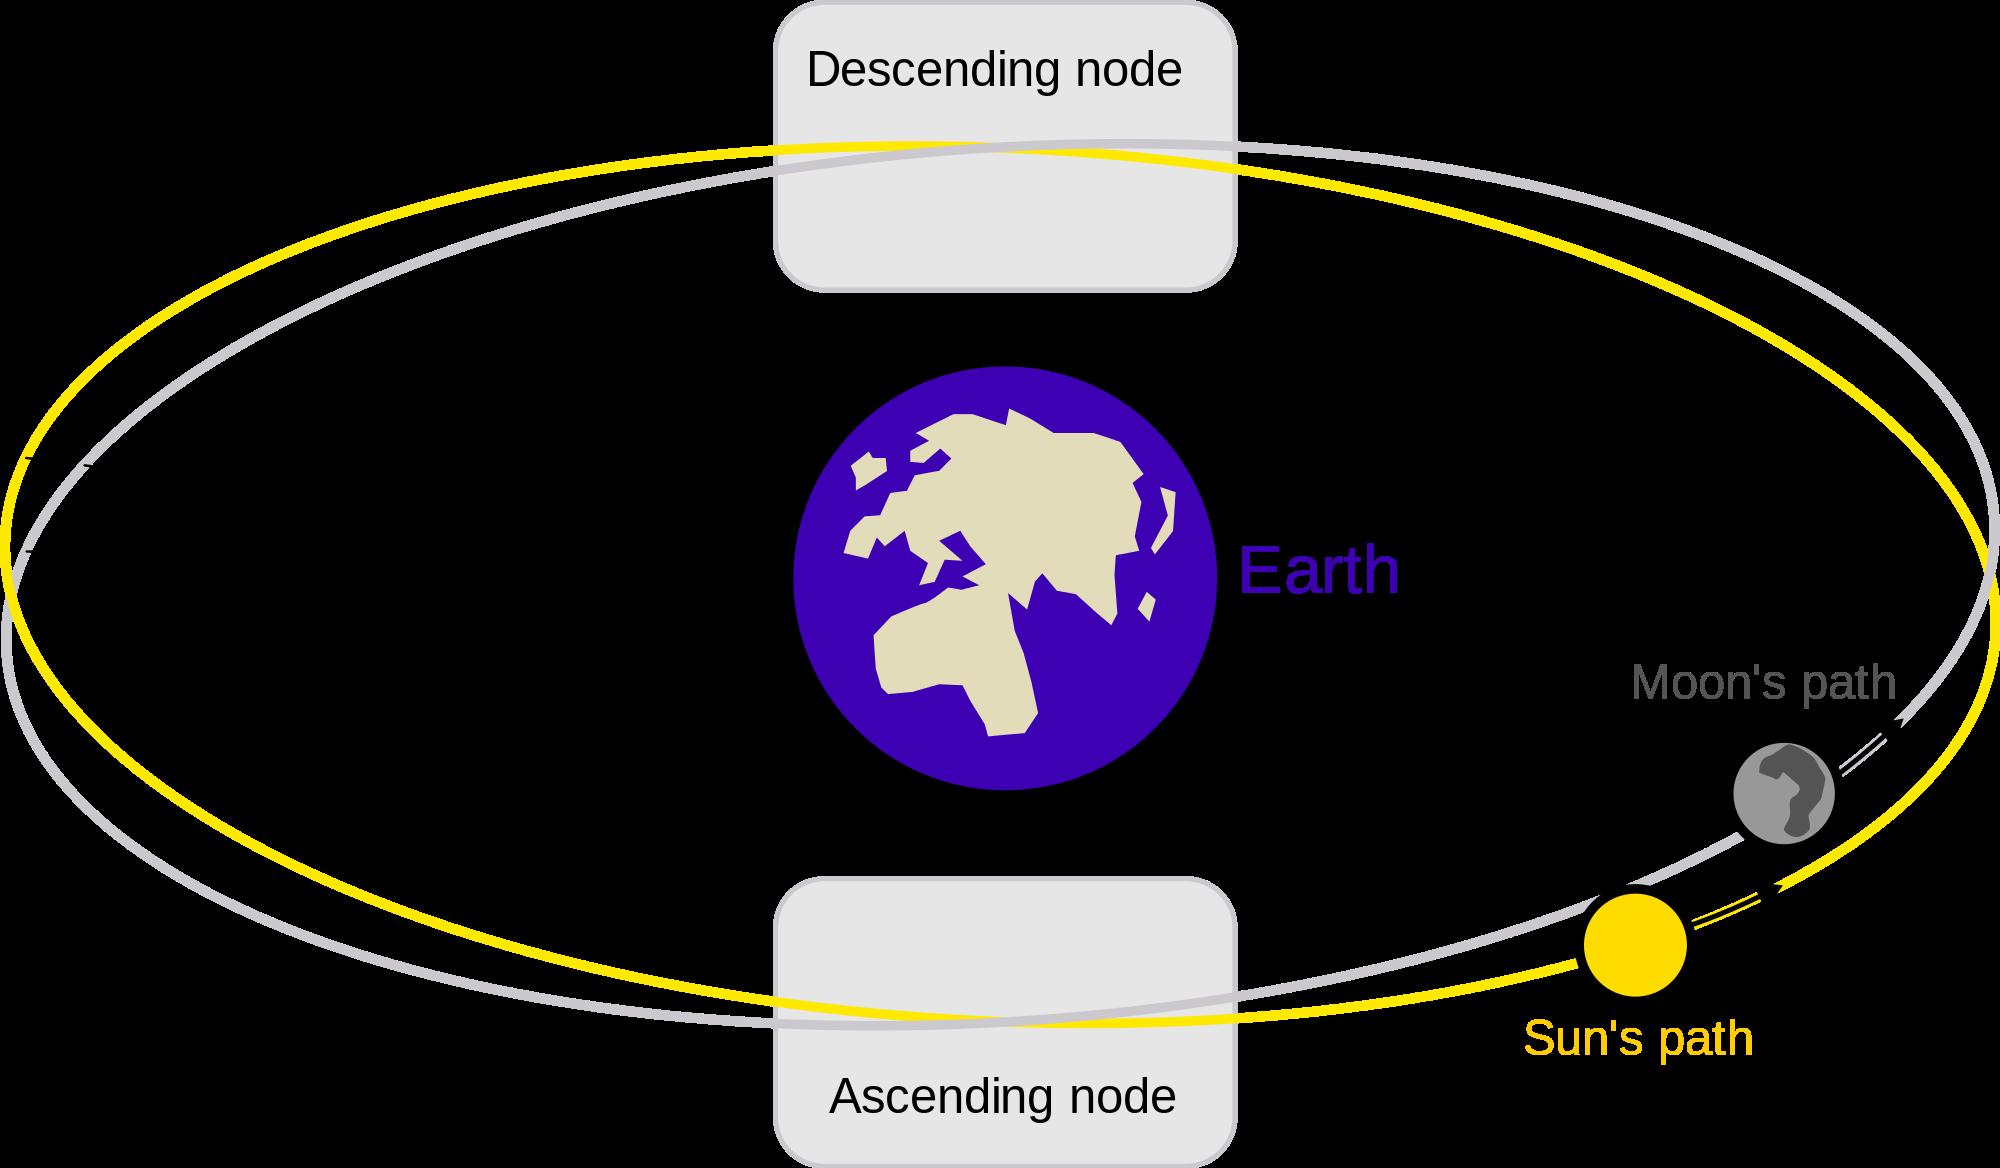 Solar Eclipse Diagram Solar Eclipse 2017 Article Khan Academy